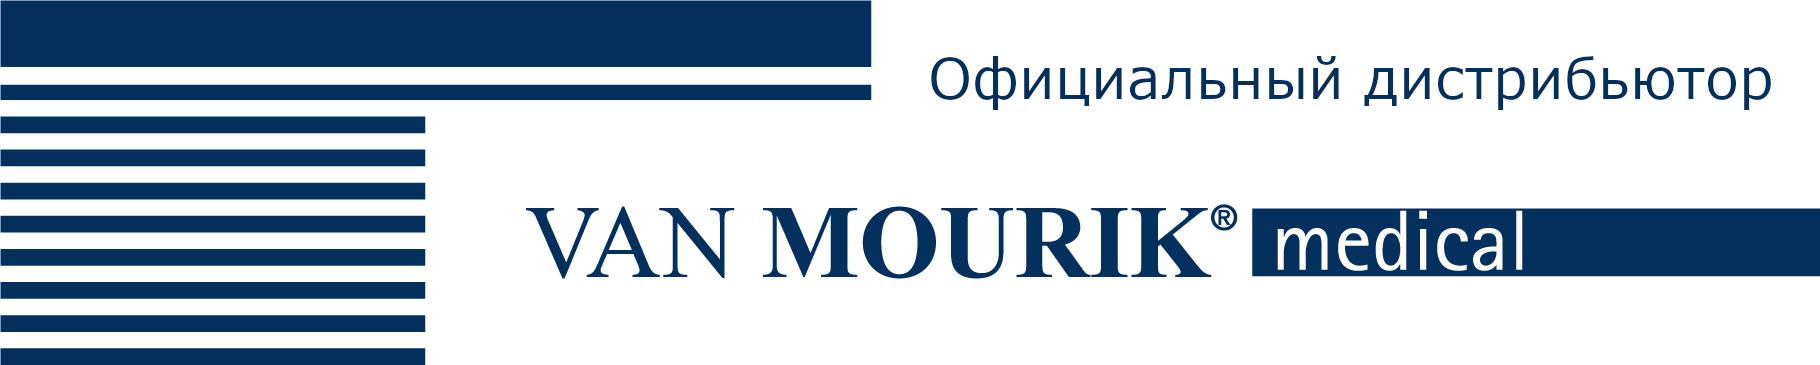 Van-Mourik-Medical